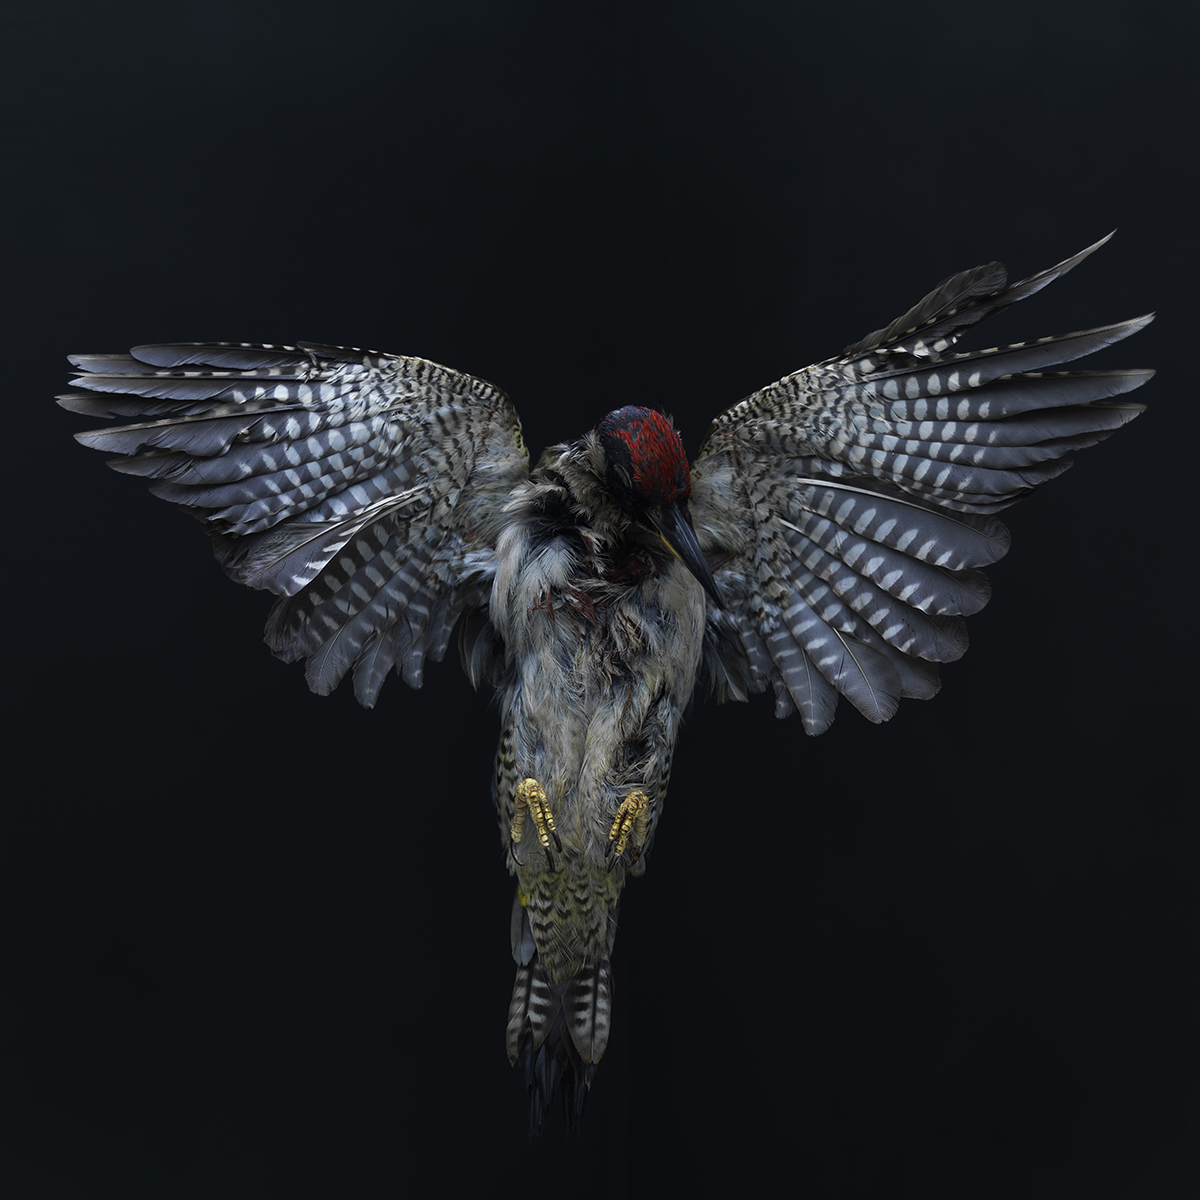 Bird no 3